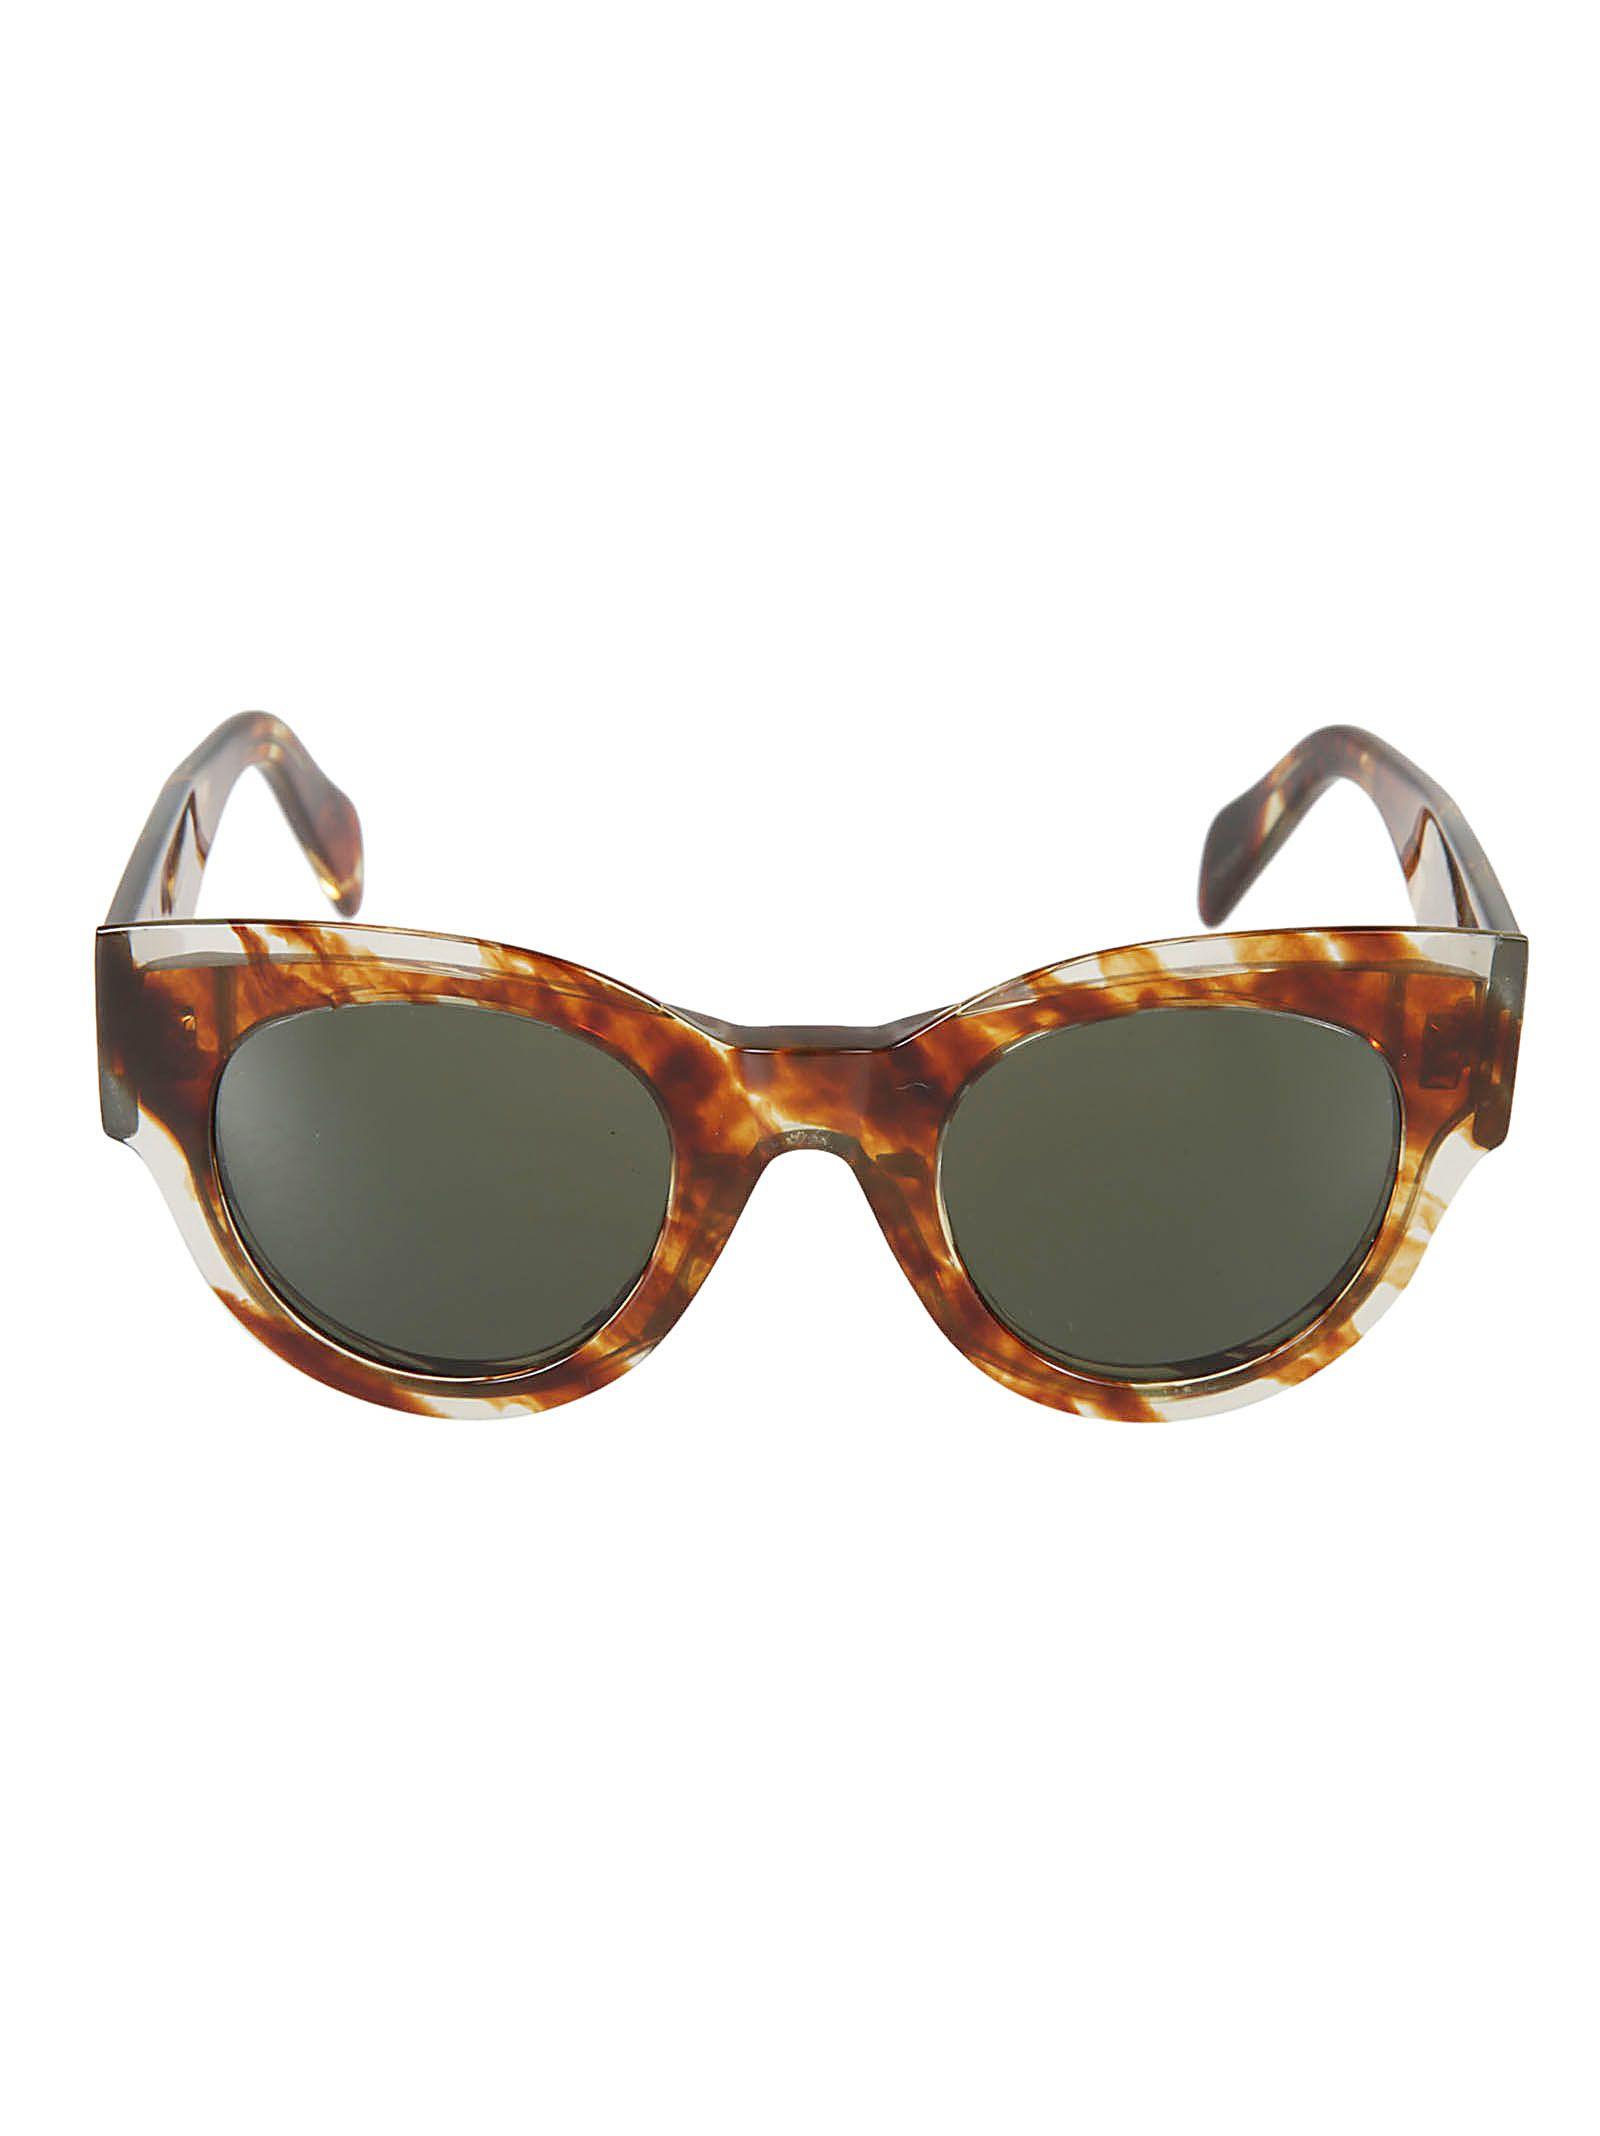 celine - Céline Round Framed Sunglasses